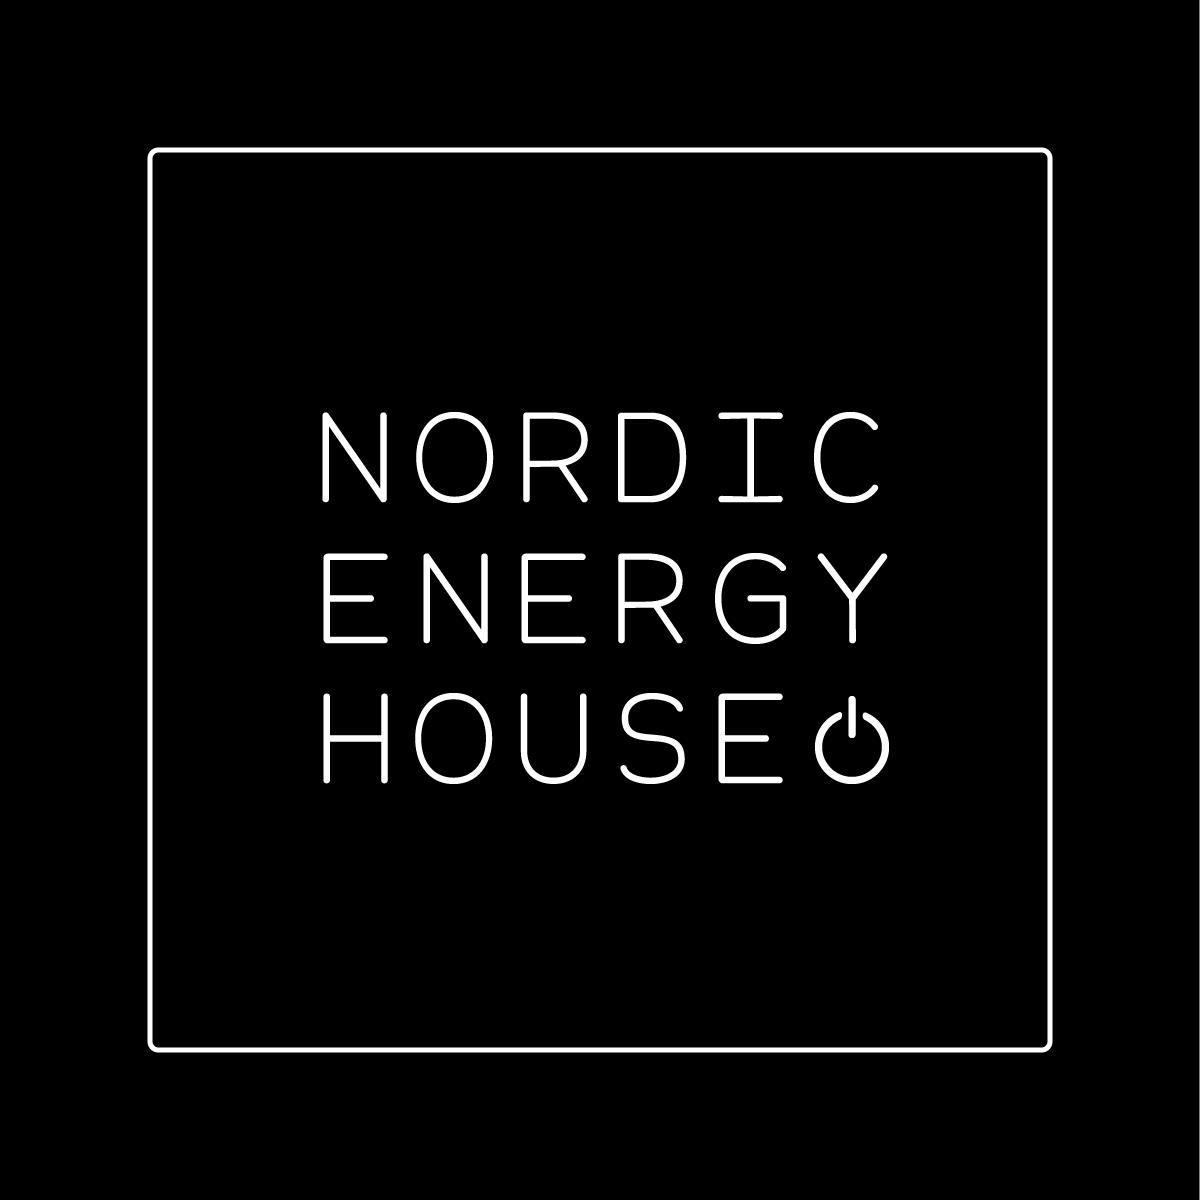 Nordic Energy House